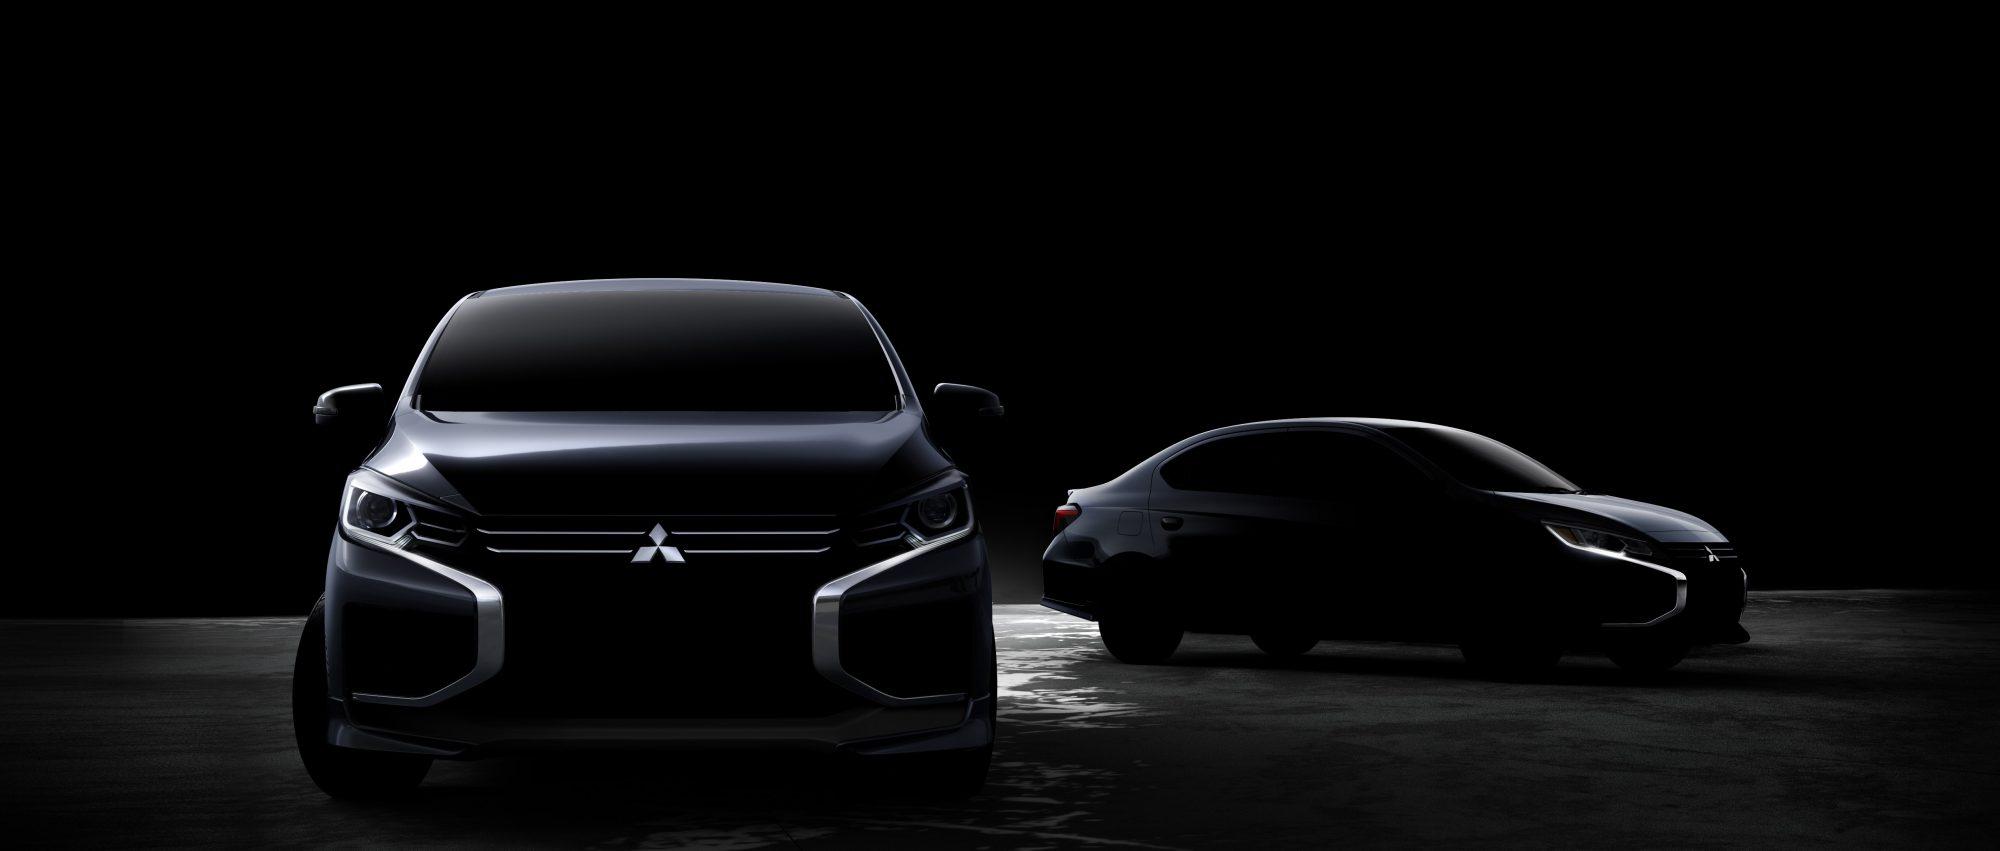 Space Star / Mirage e Attrage: Mitsubishi Motors rinnova i suoi modelli thumbnail